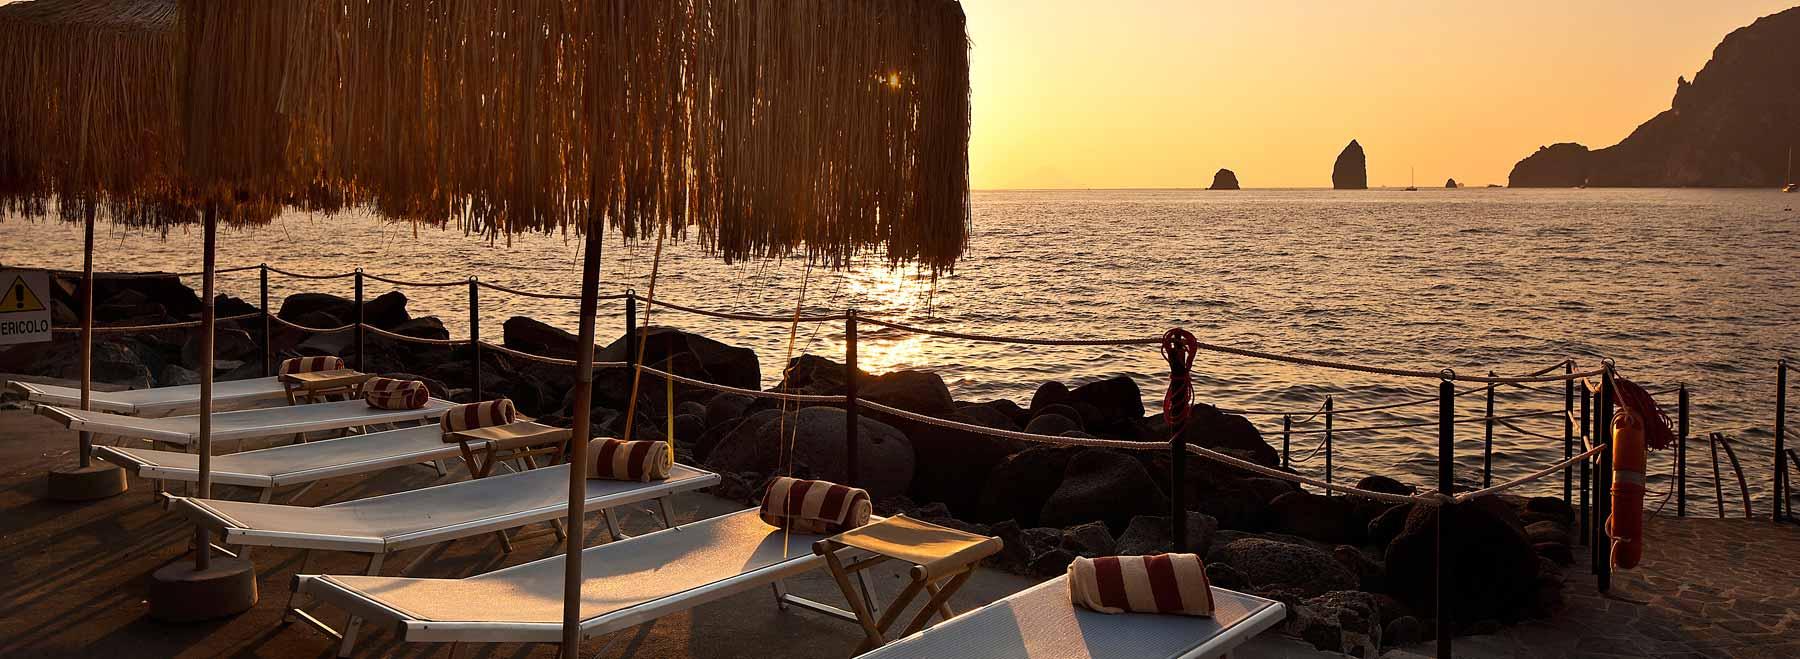 Aerolian Islands, Sicily